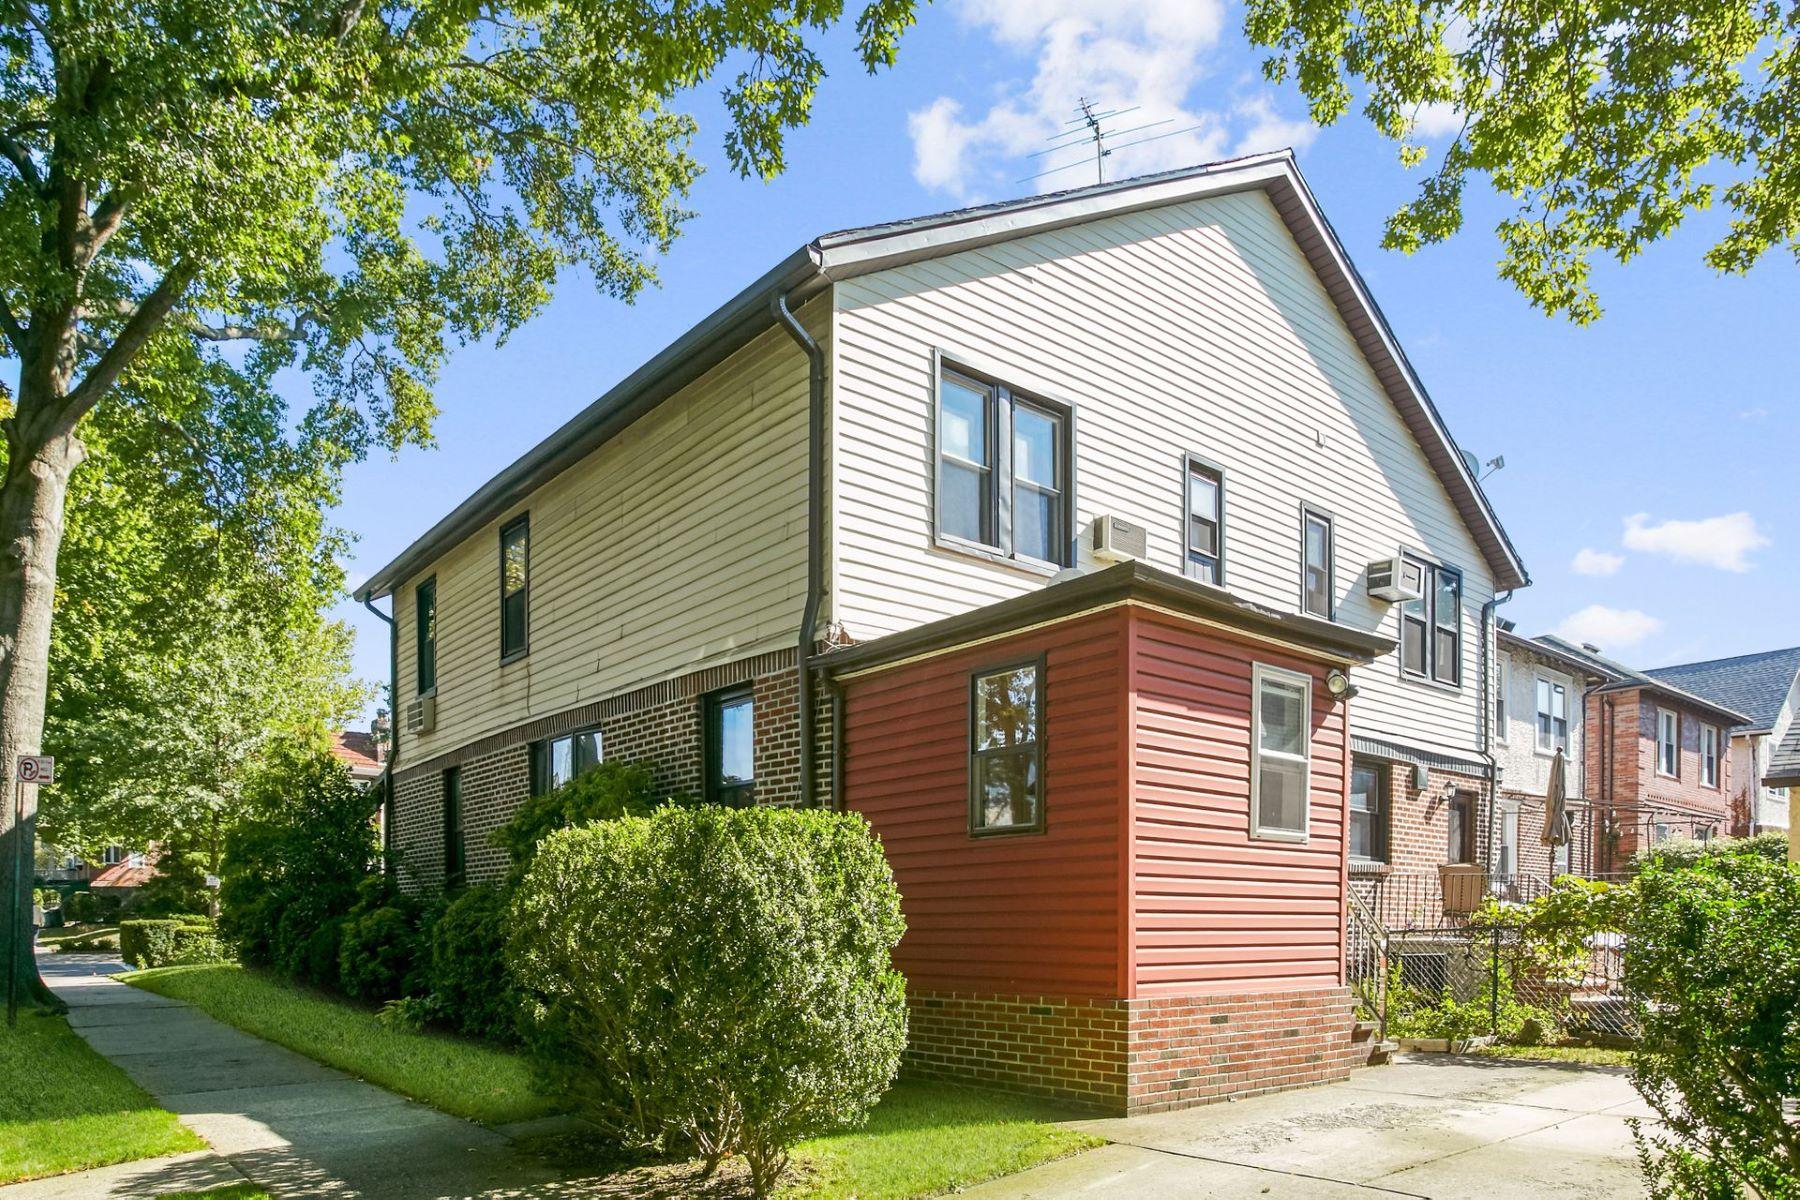 Additional photo for property listing at Forest Hills 68-02 Fleet St, Forest Hills, New York 11375 Förenta staterna